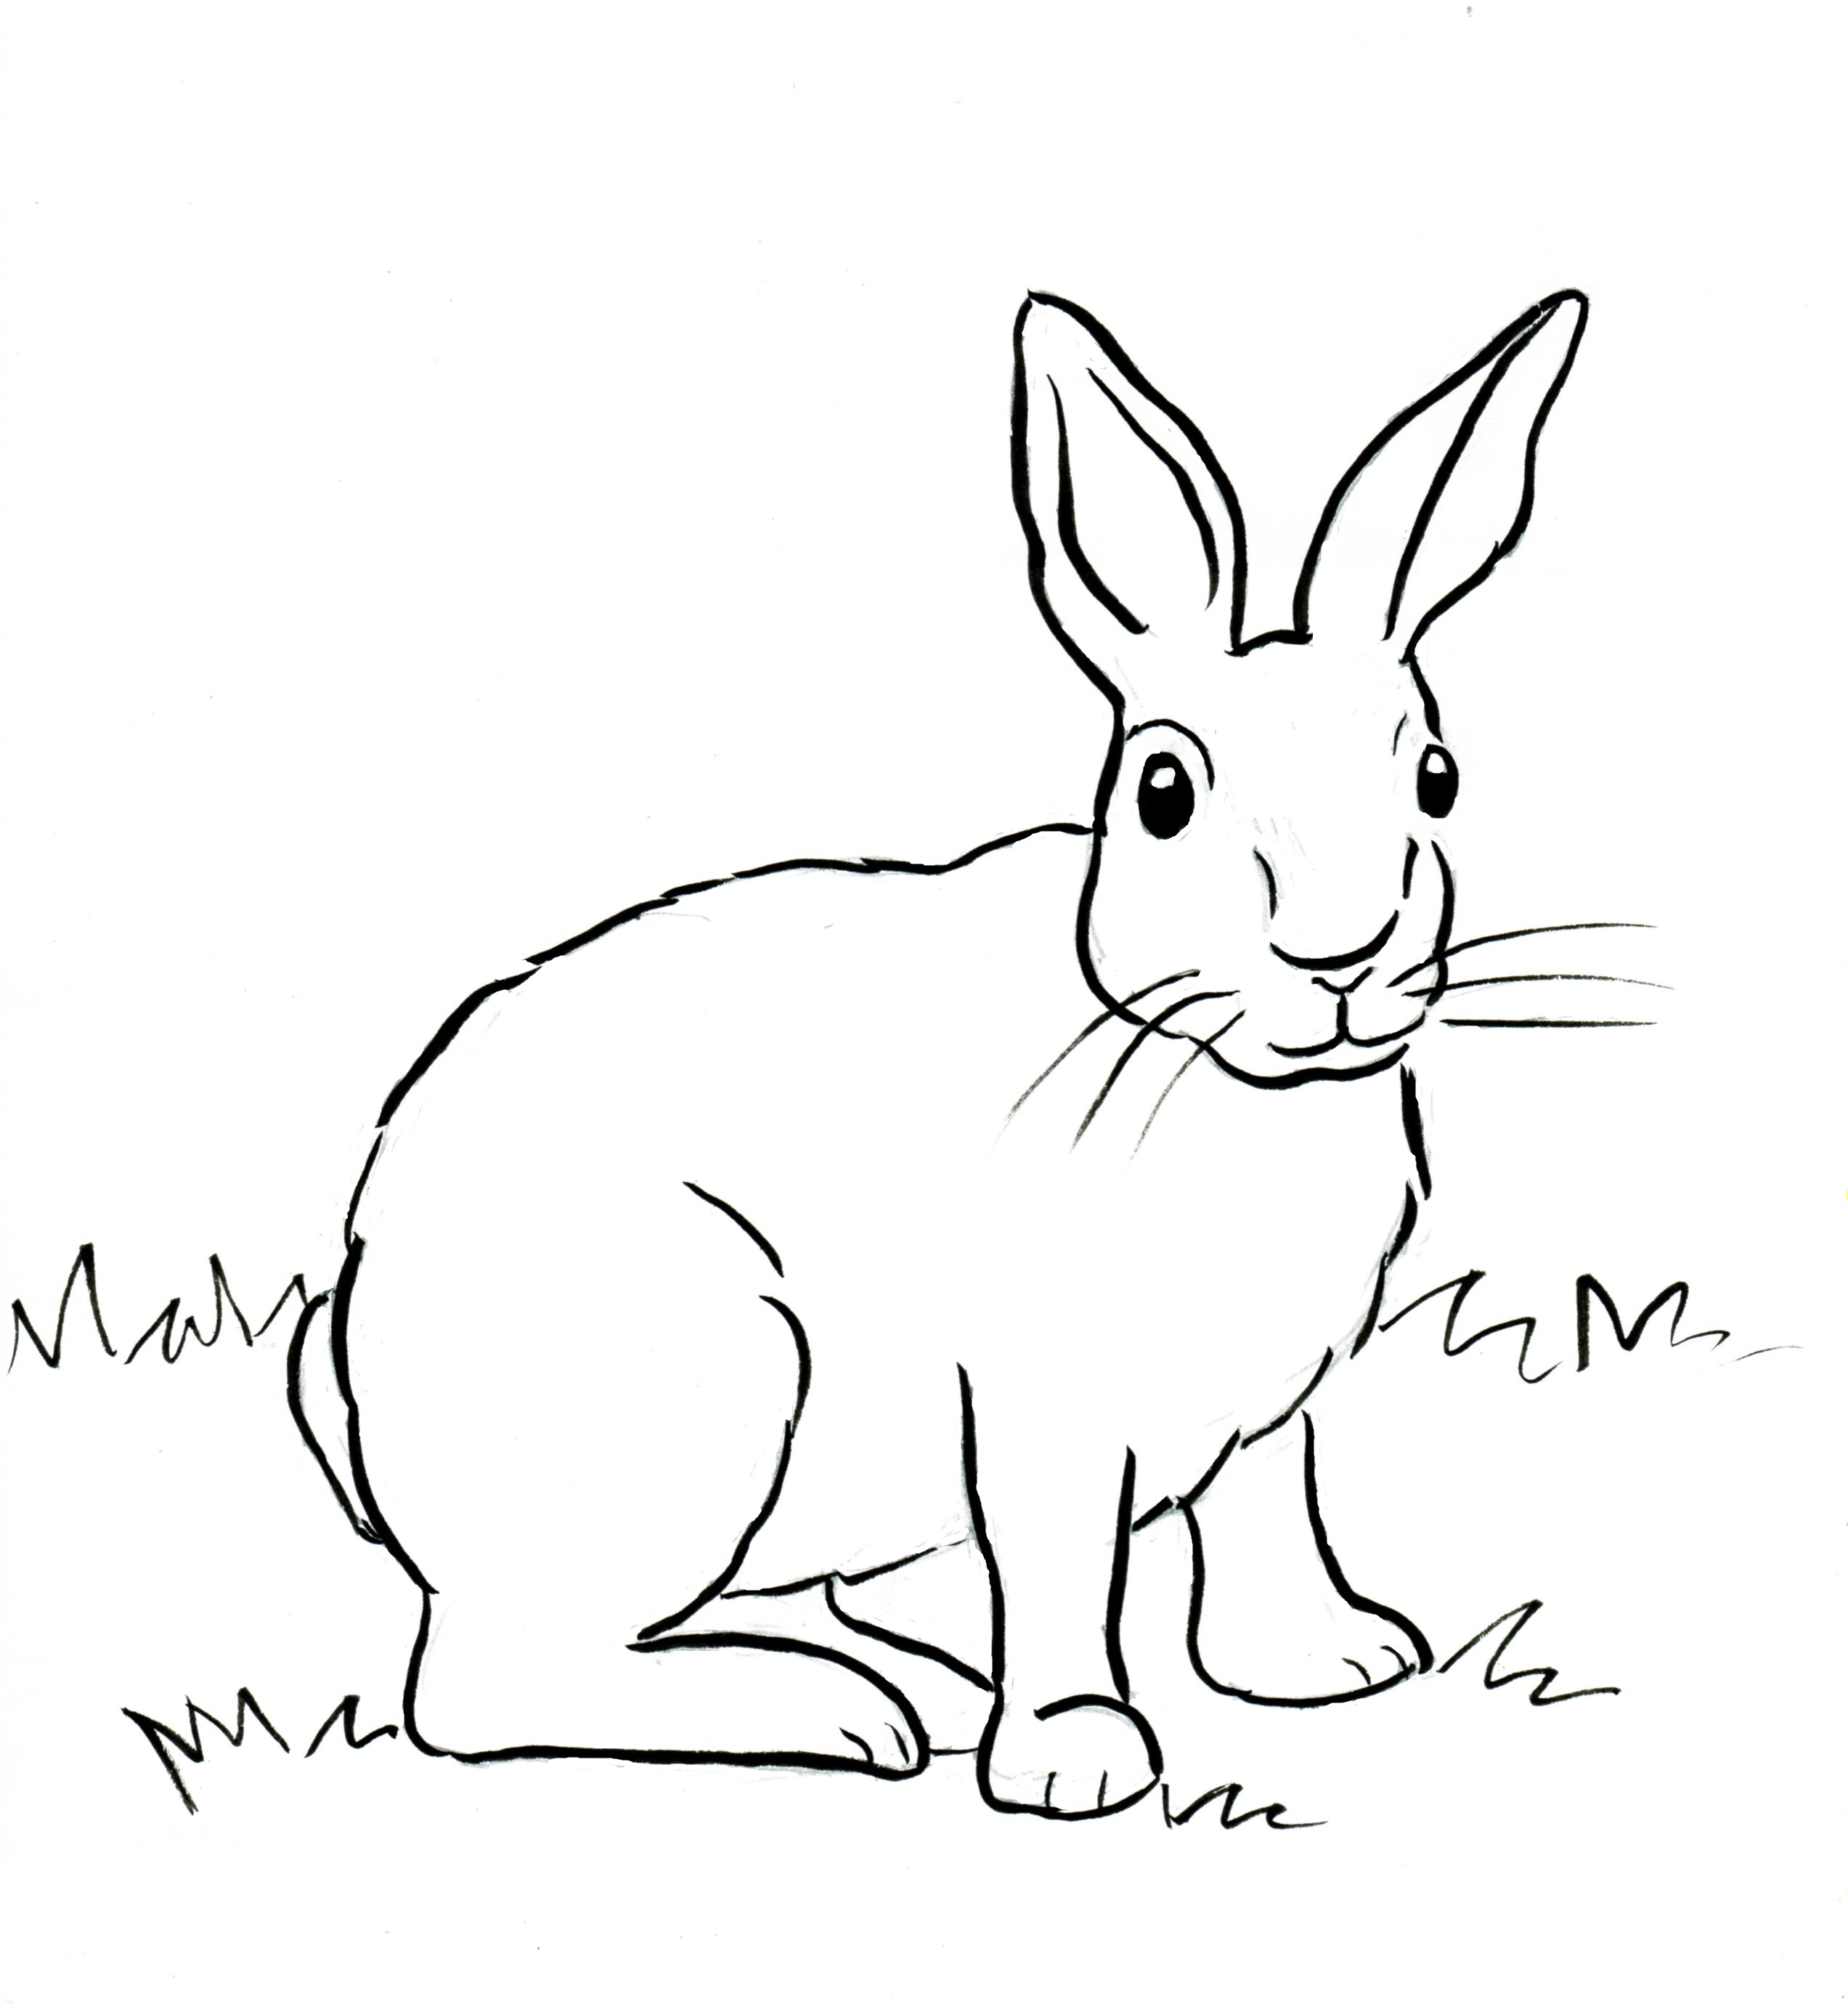 Drawn rabbid wild rabbit Page Samantha Bell  Rabbit